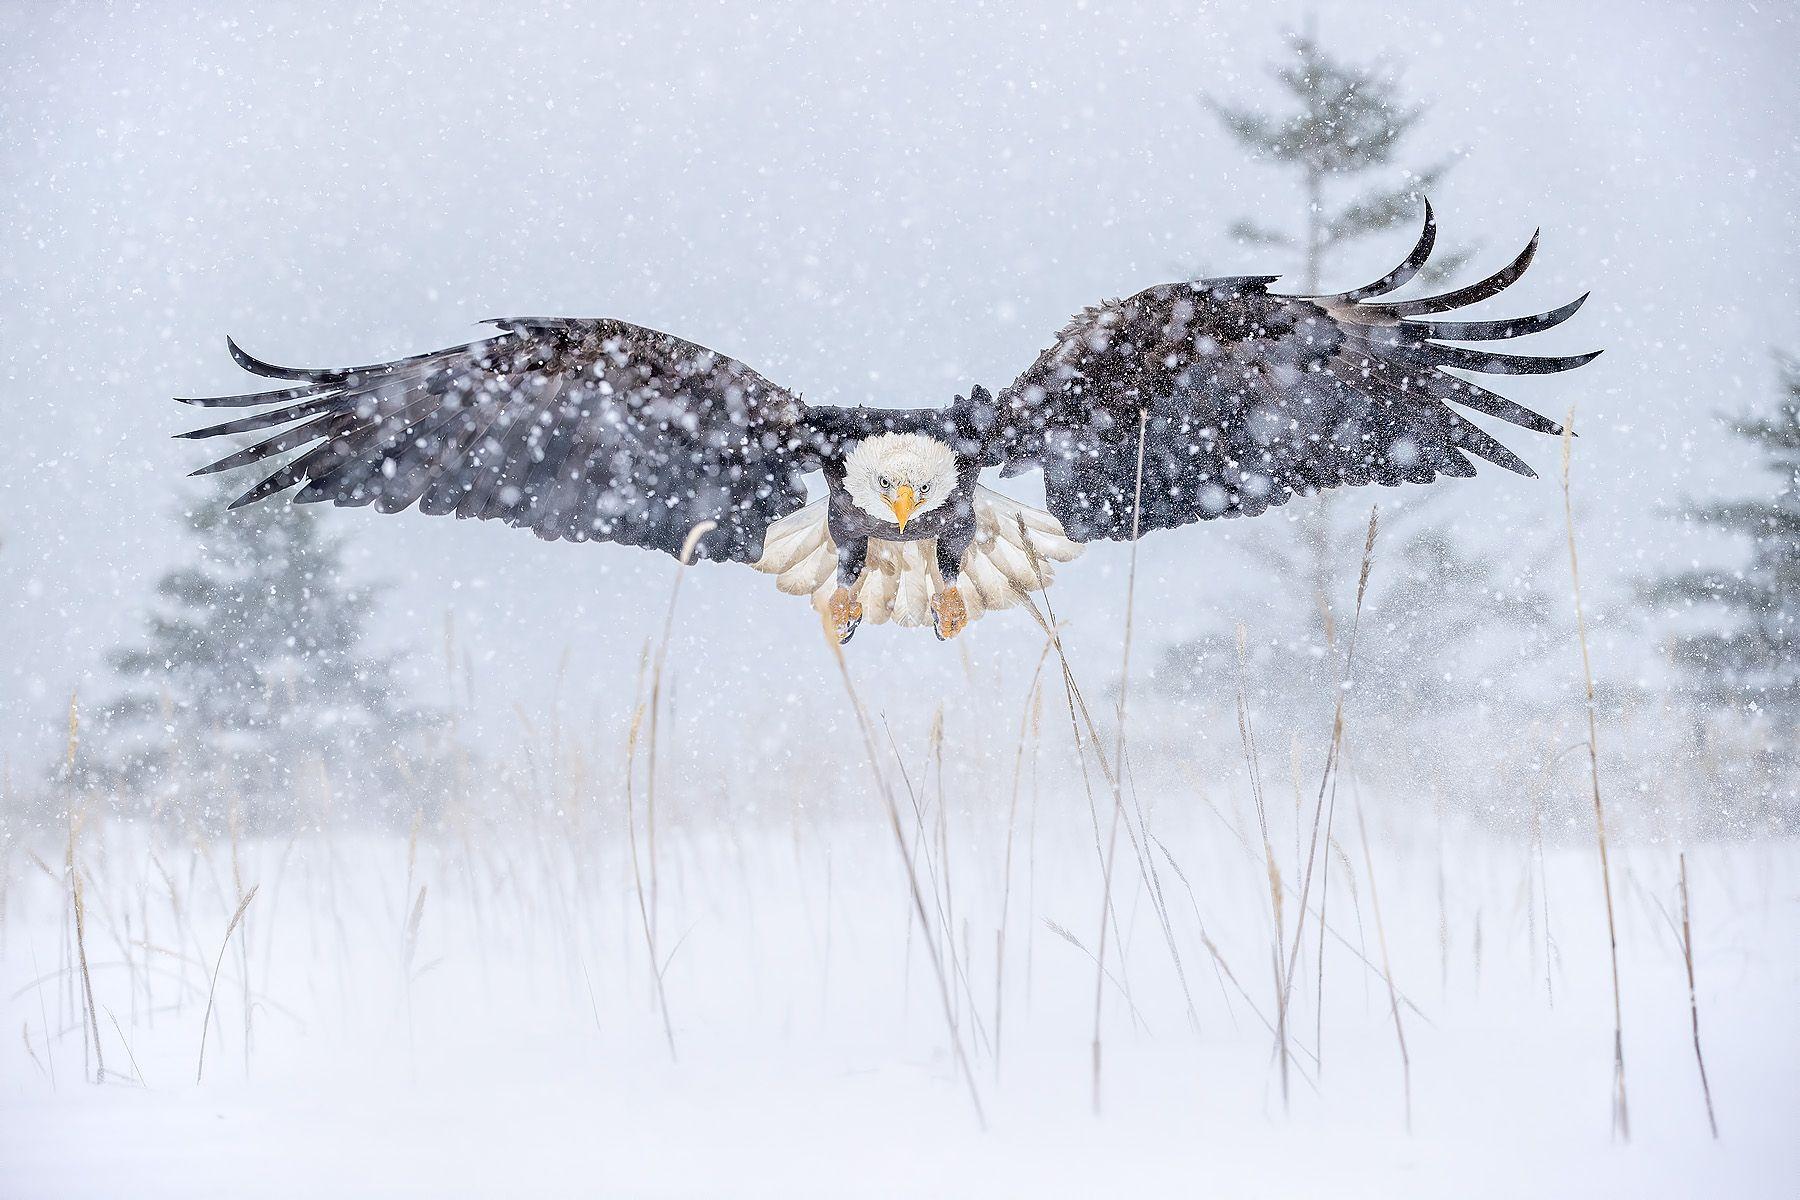 Bald eagle approach in snow storm_95I4886-Kachemak Bay, Kenai Peninsula, AK, USA.jpg